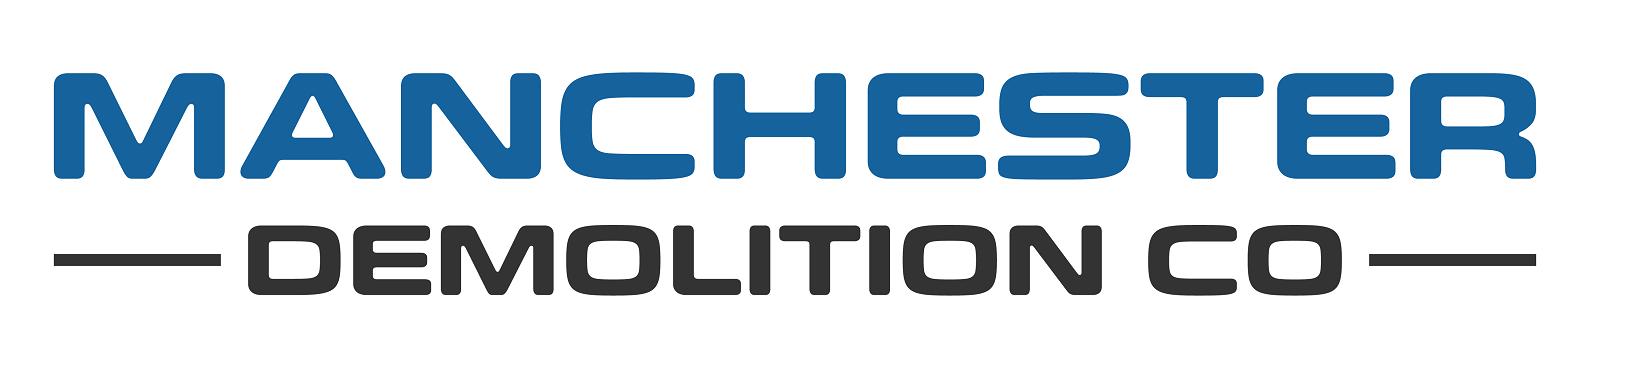 demolition co logo